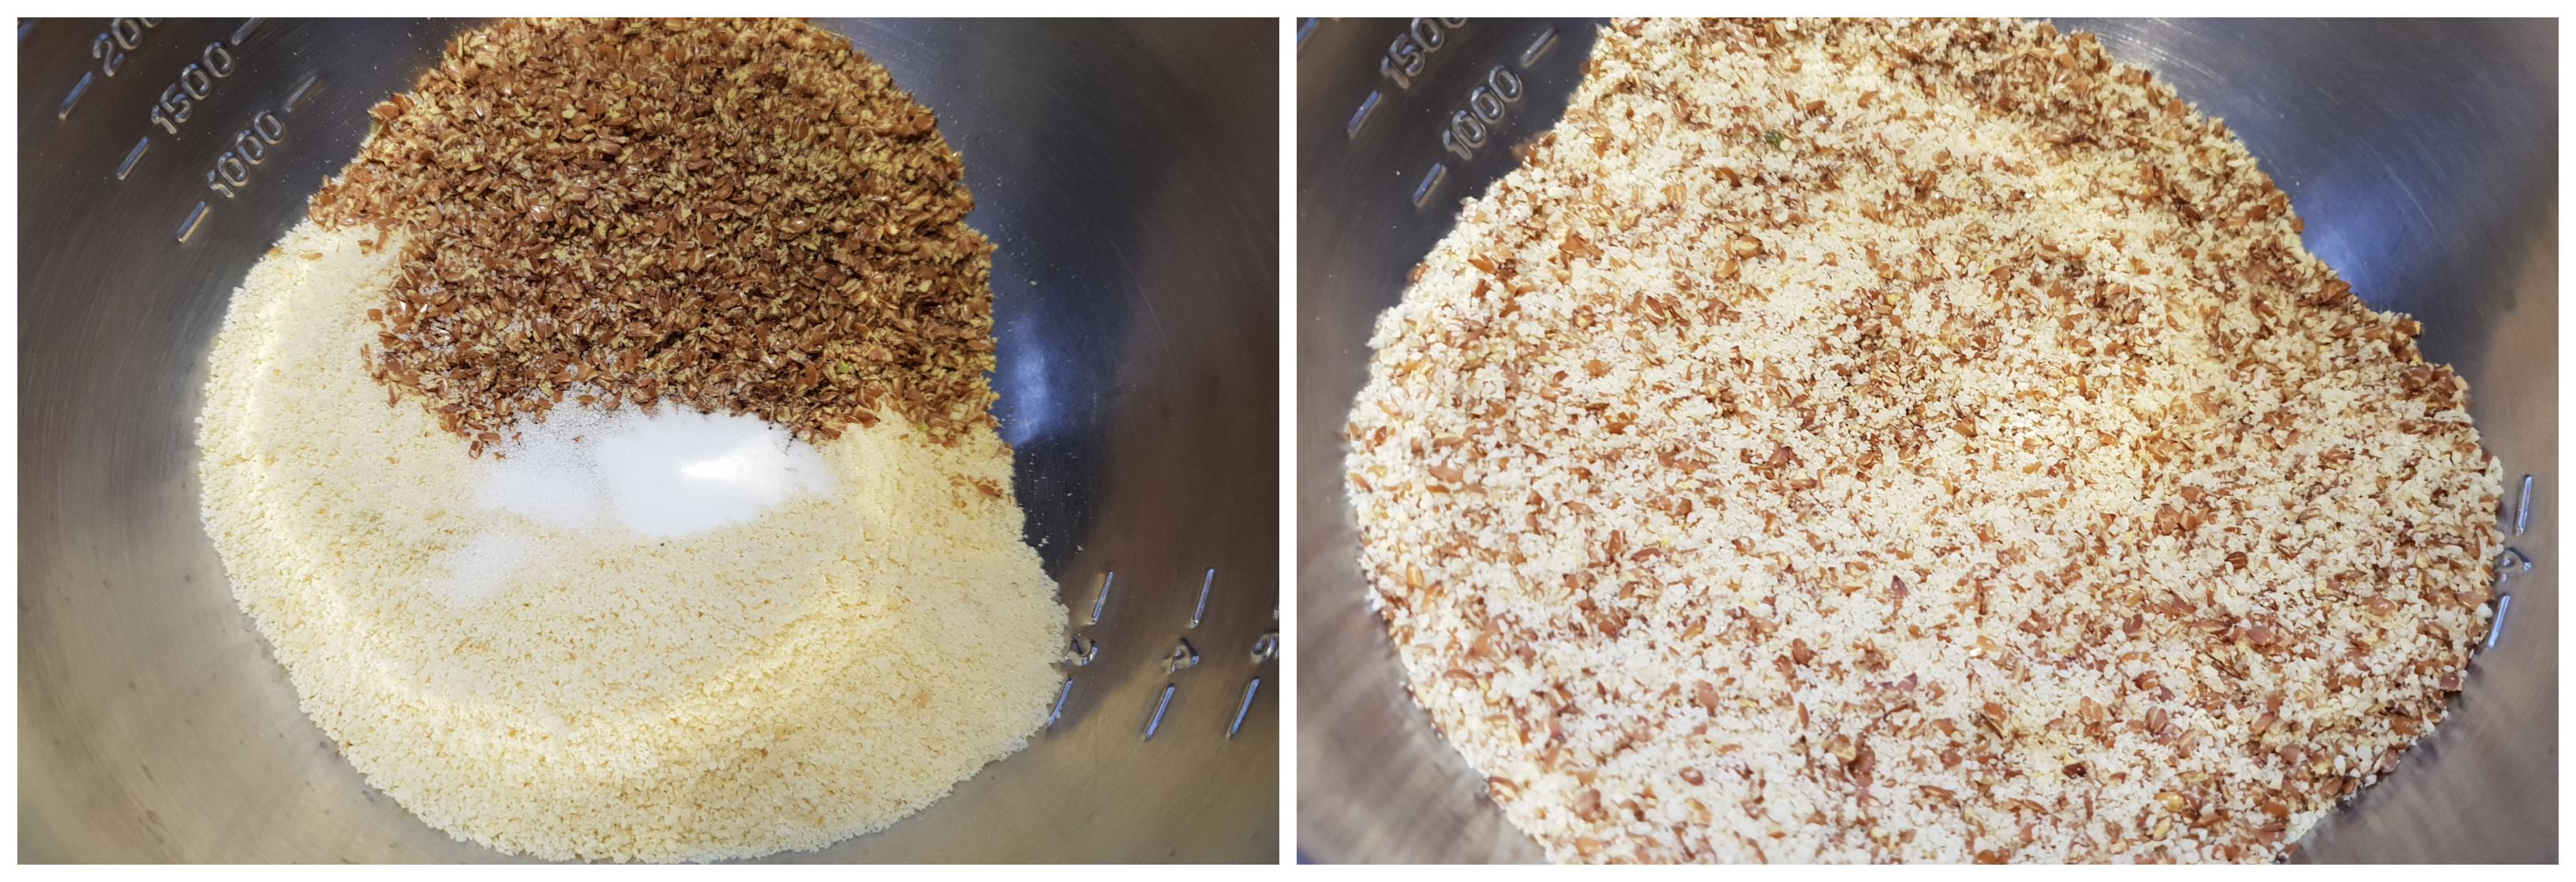 Dadel Amandel Cake - mengen droge ingrediënten